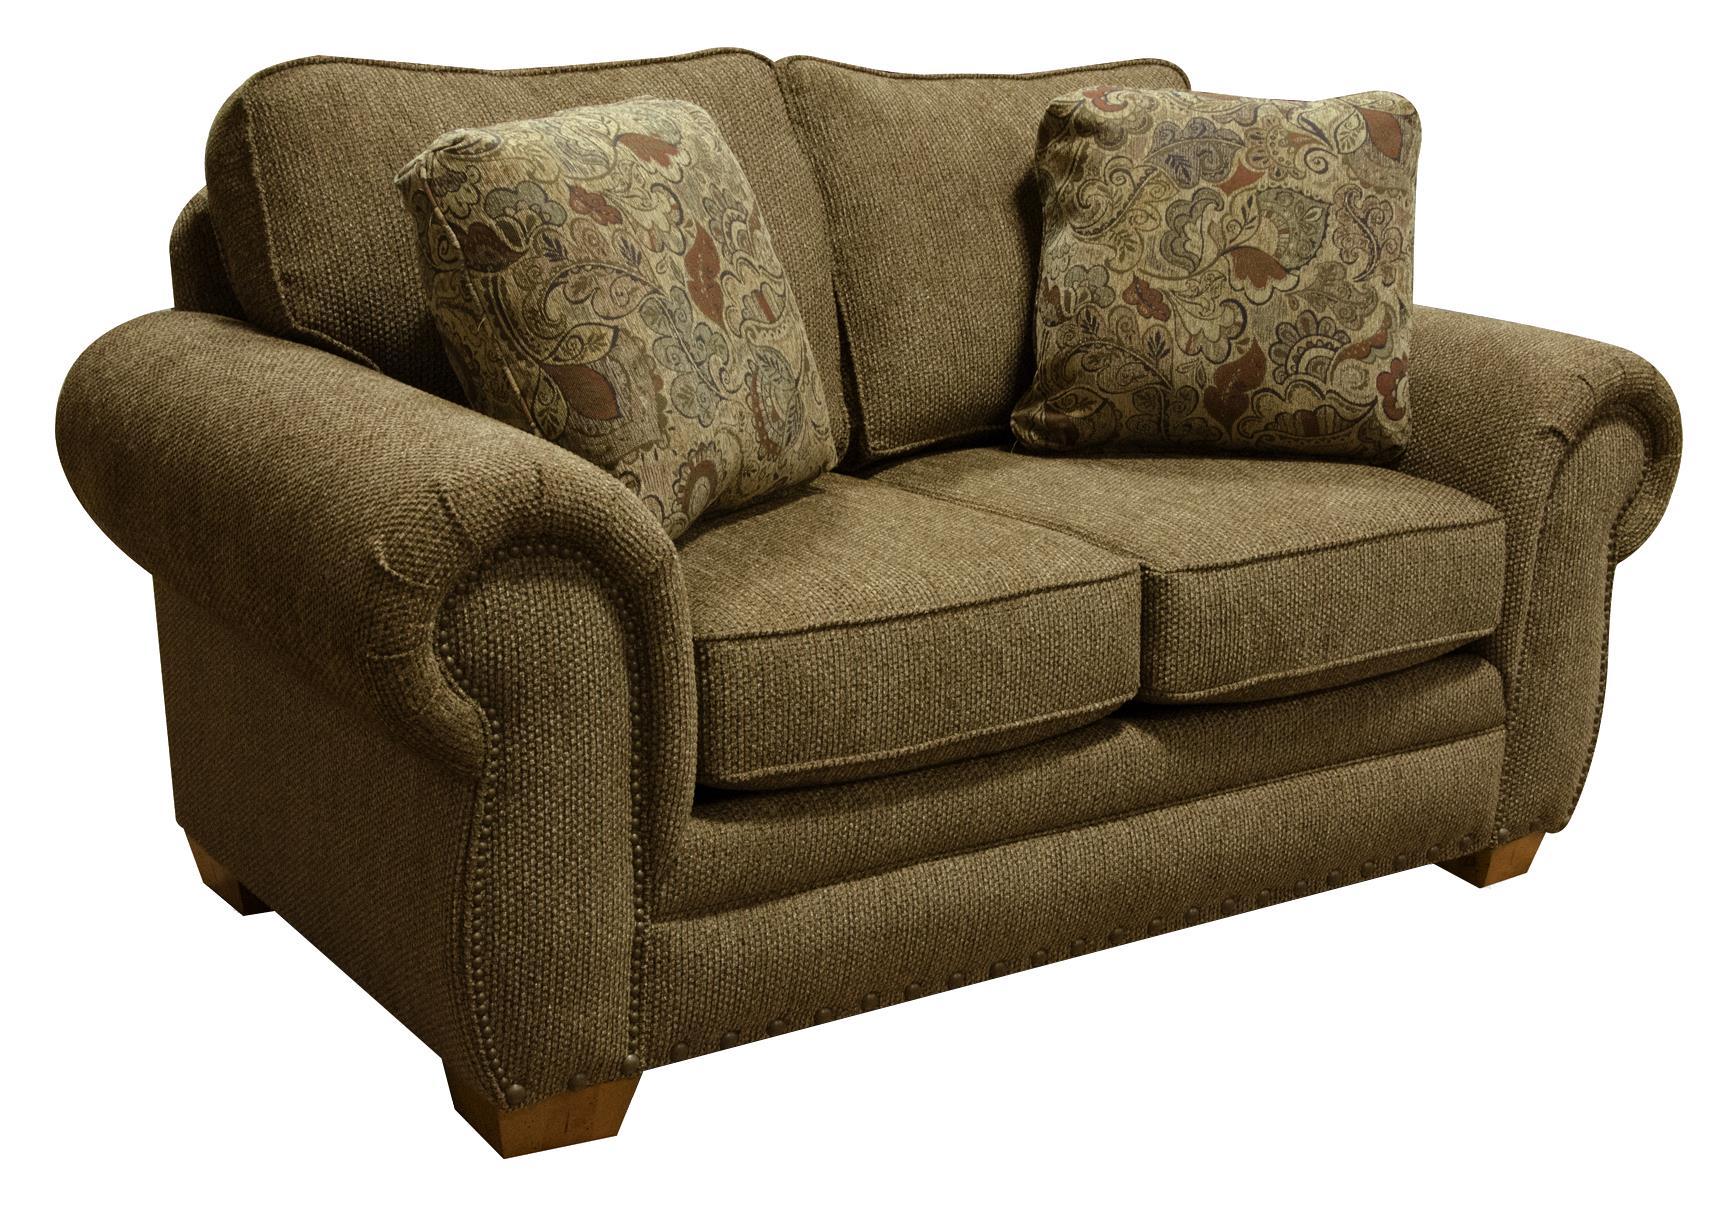 England Walters 6639n Sofa Sleeper With Nailhead Trim